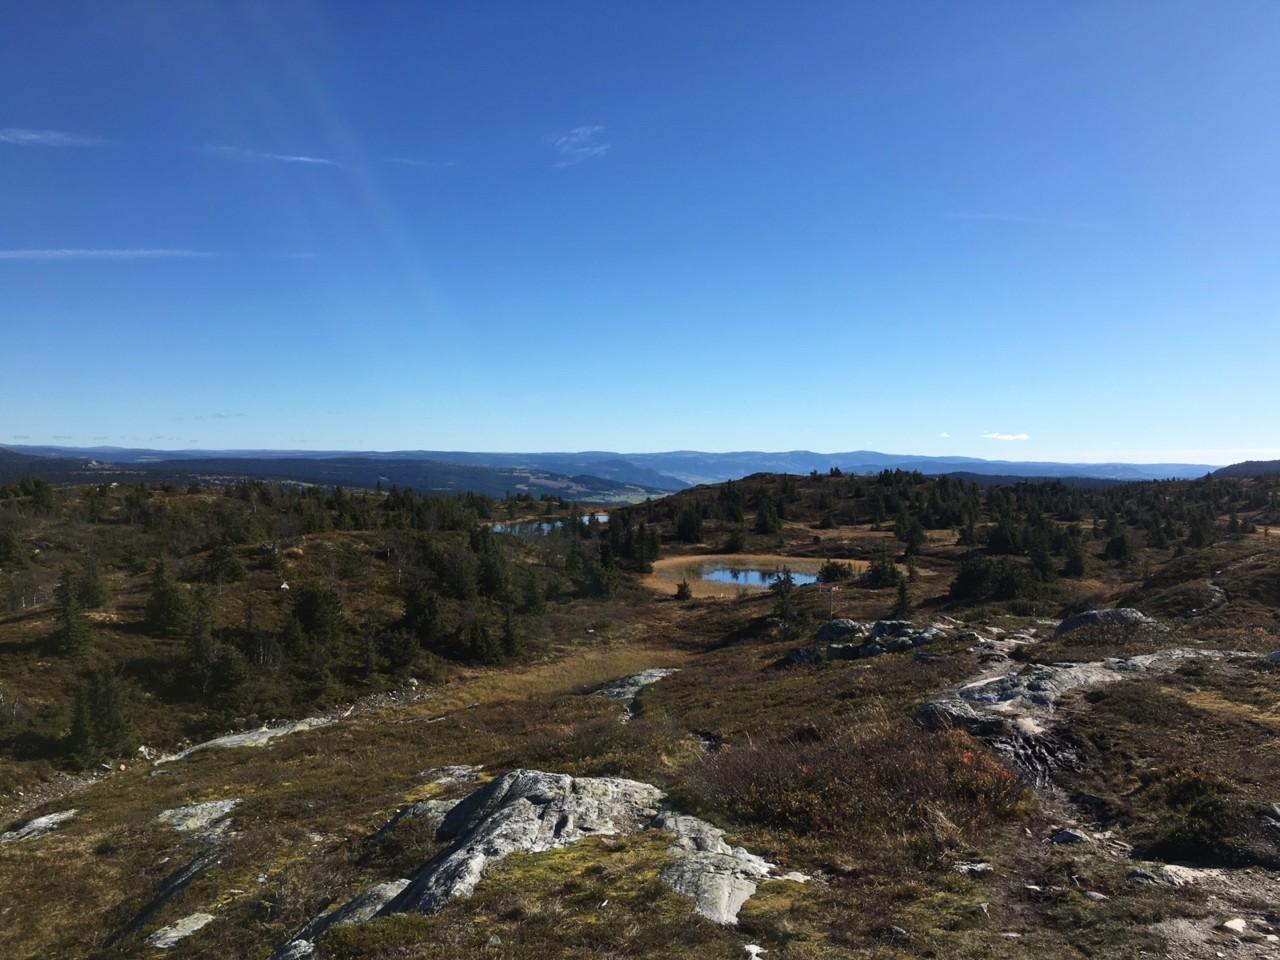 gausdal-vestfjell-haerfjellet-mountains-anja-stang